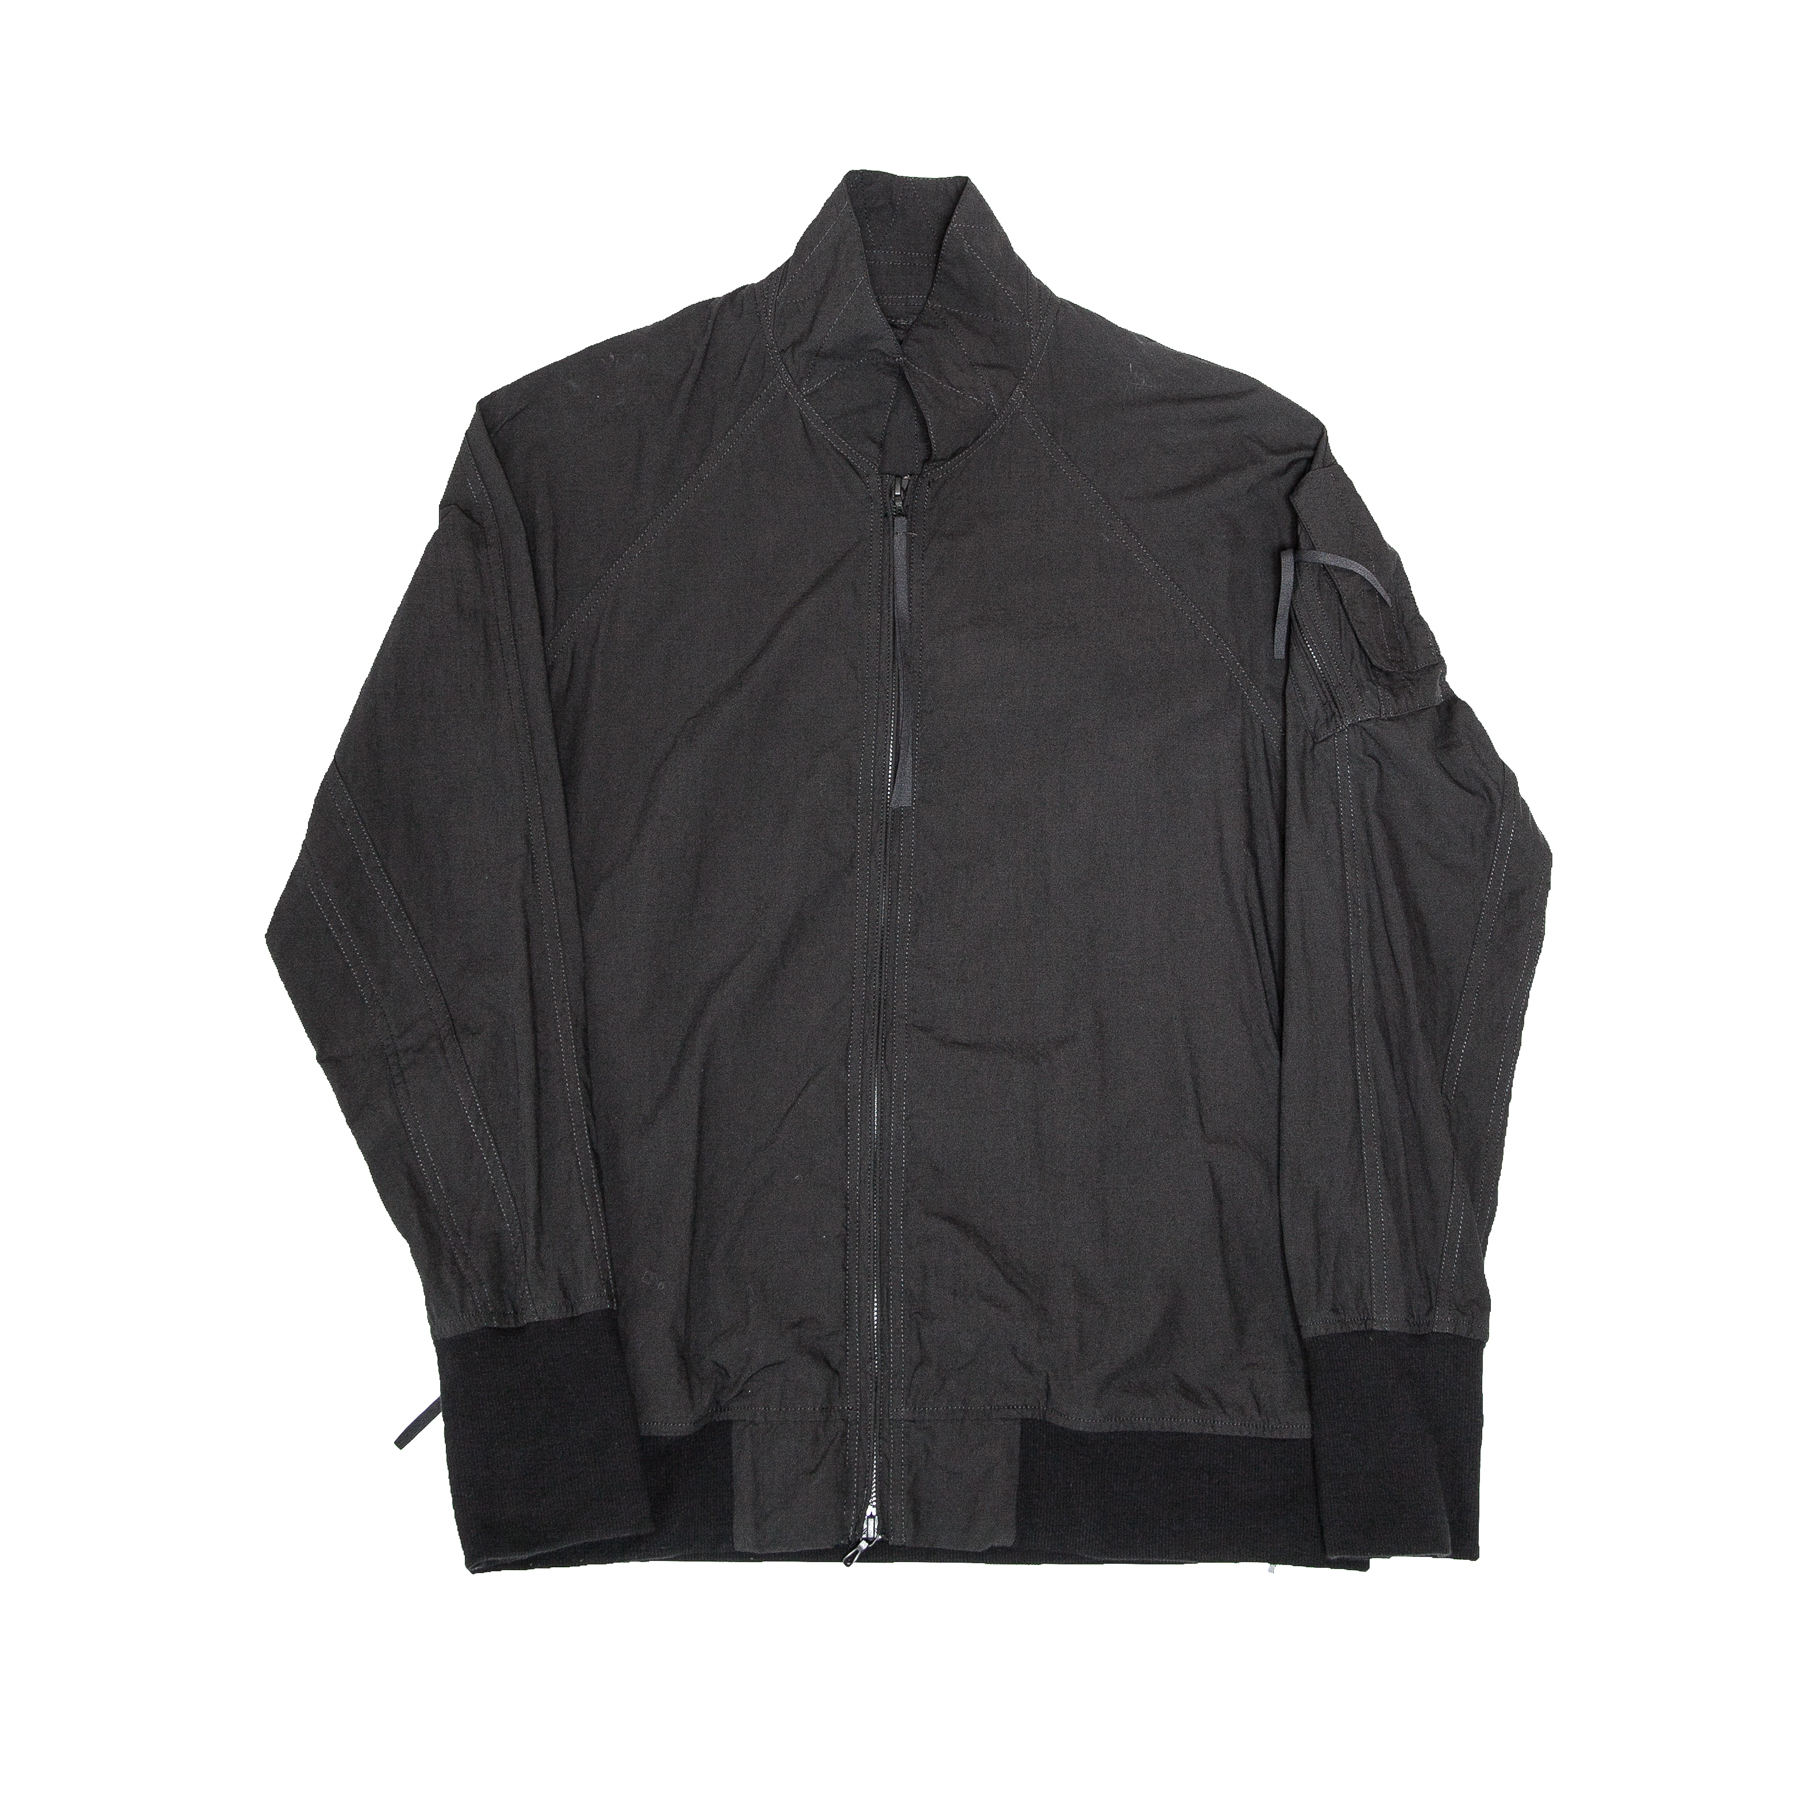 617BLM14-BLACK / MA-1